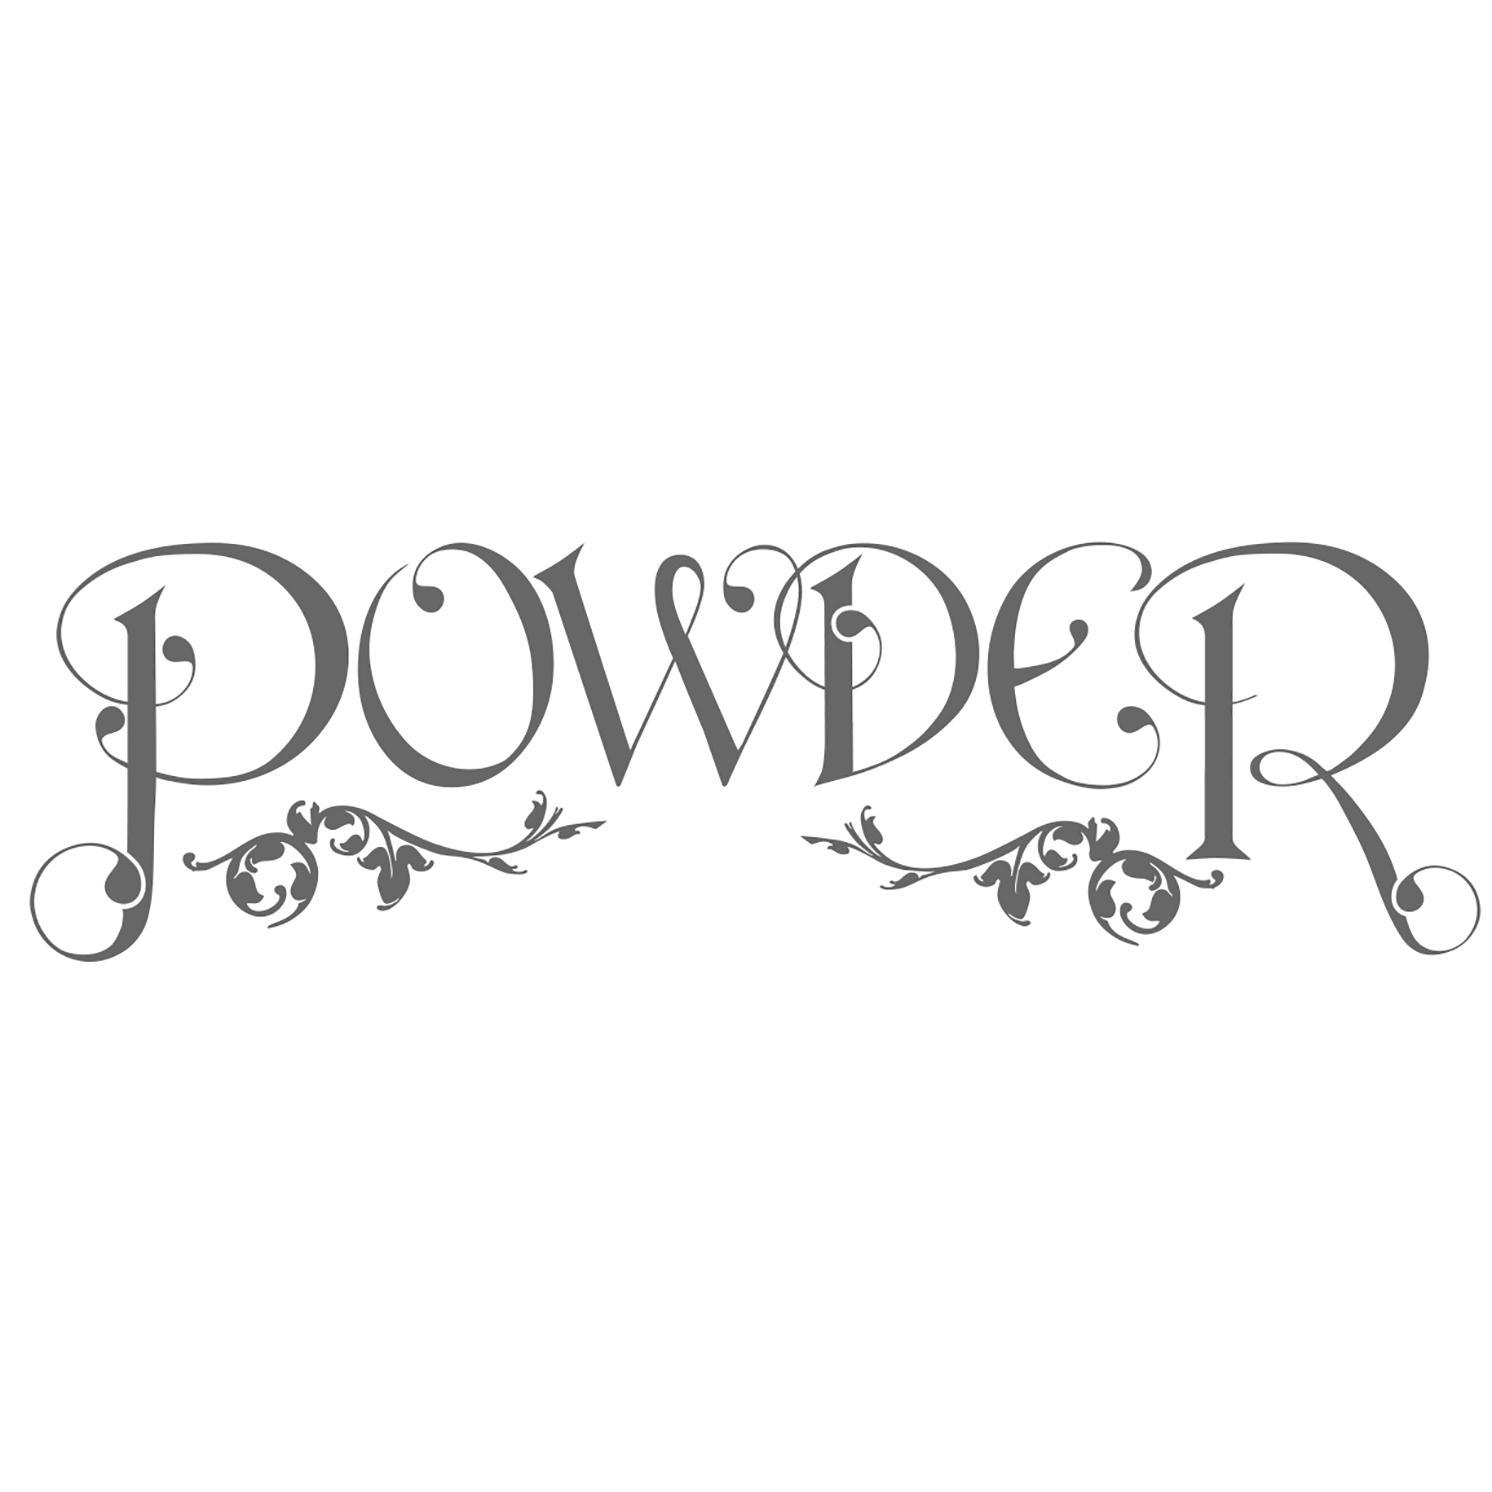 Powder Light Brown Gentlemen Chums Knee High Socks with Presentation Gift Bag